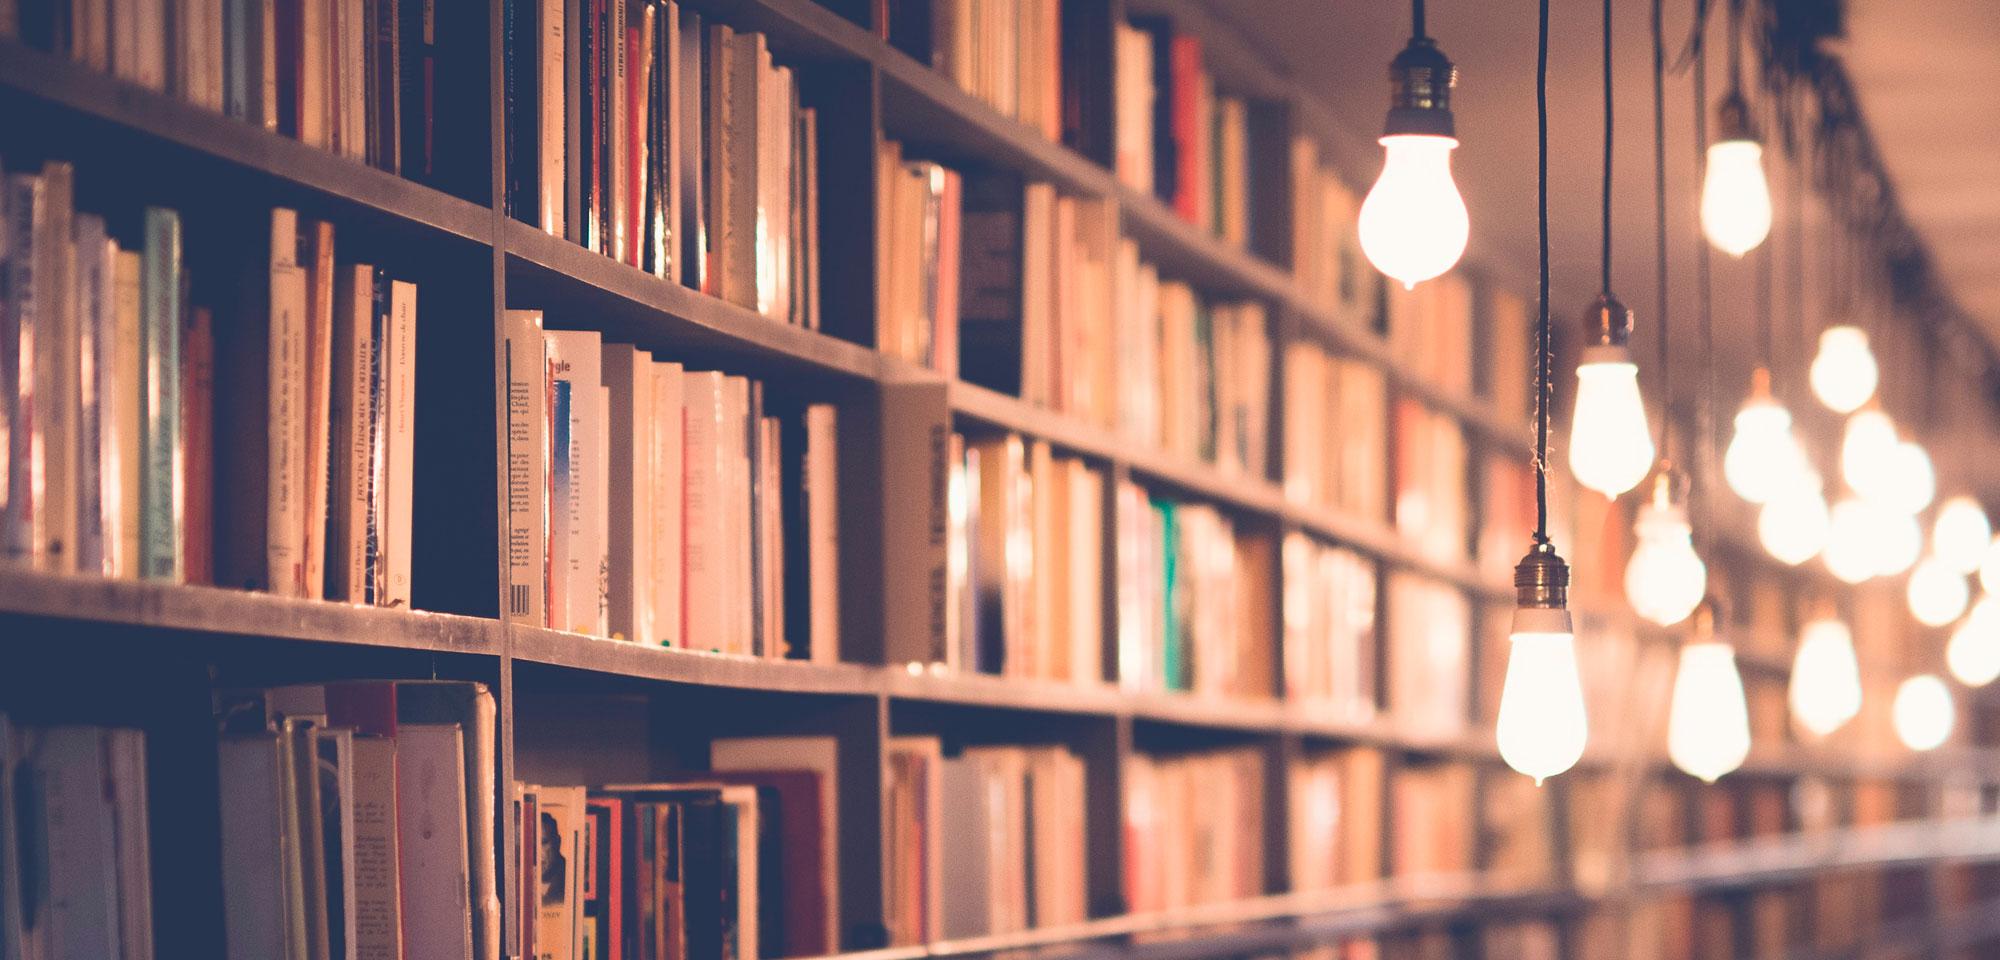 bibliotcanews